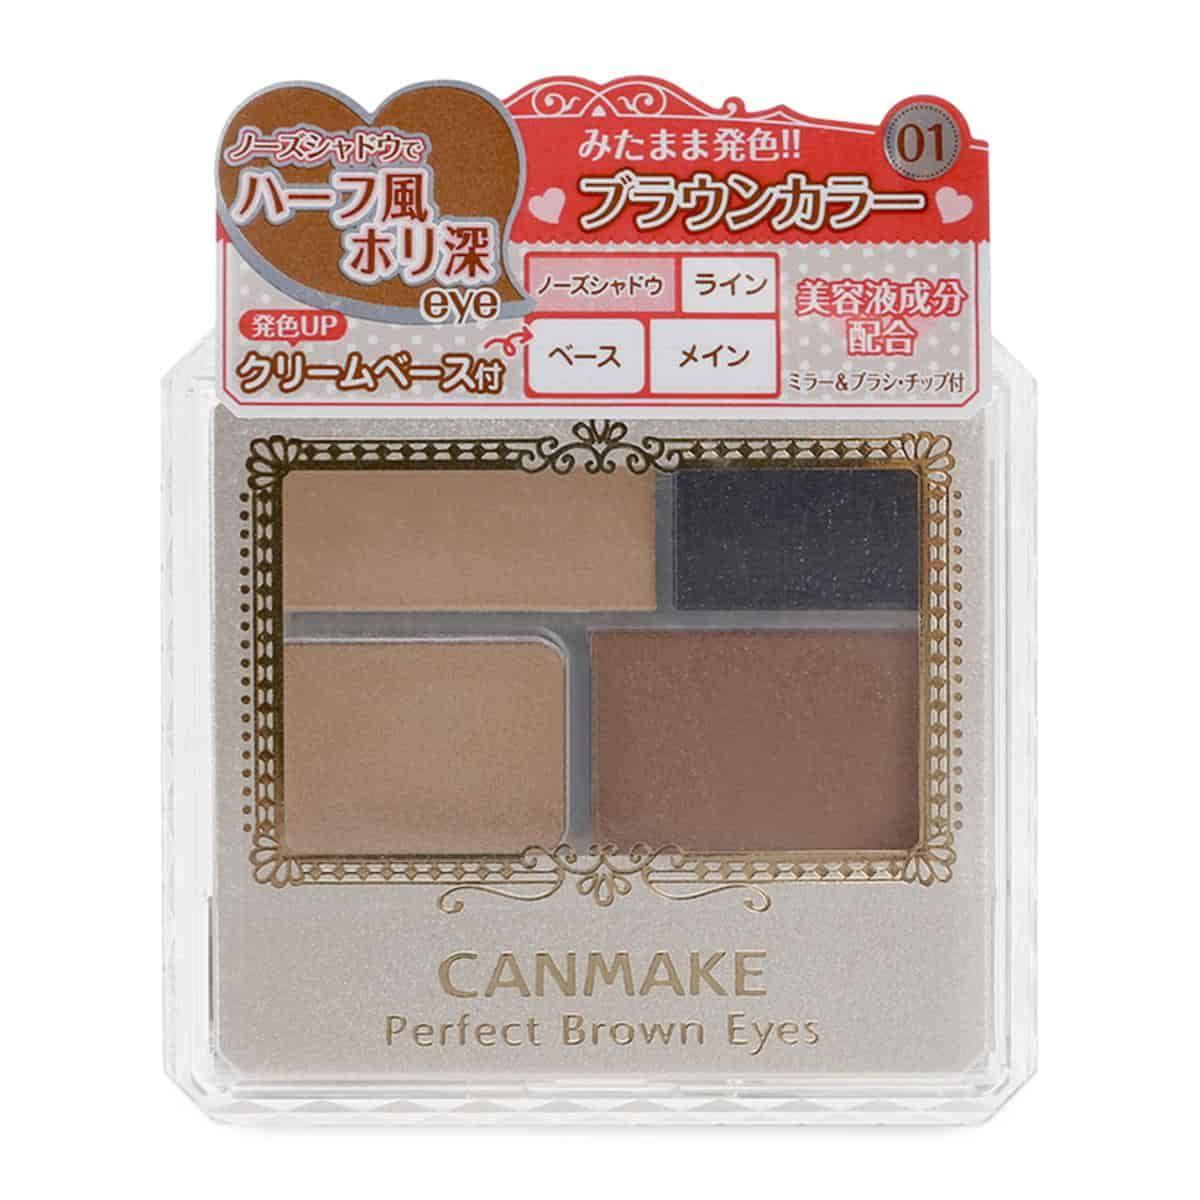 phan-mat-canmake-Perfect Stylist Eyes